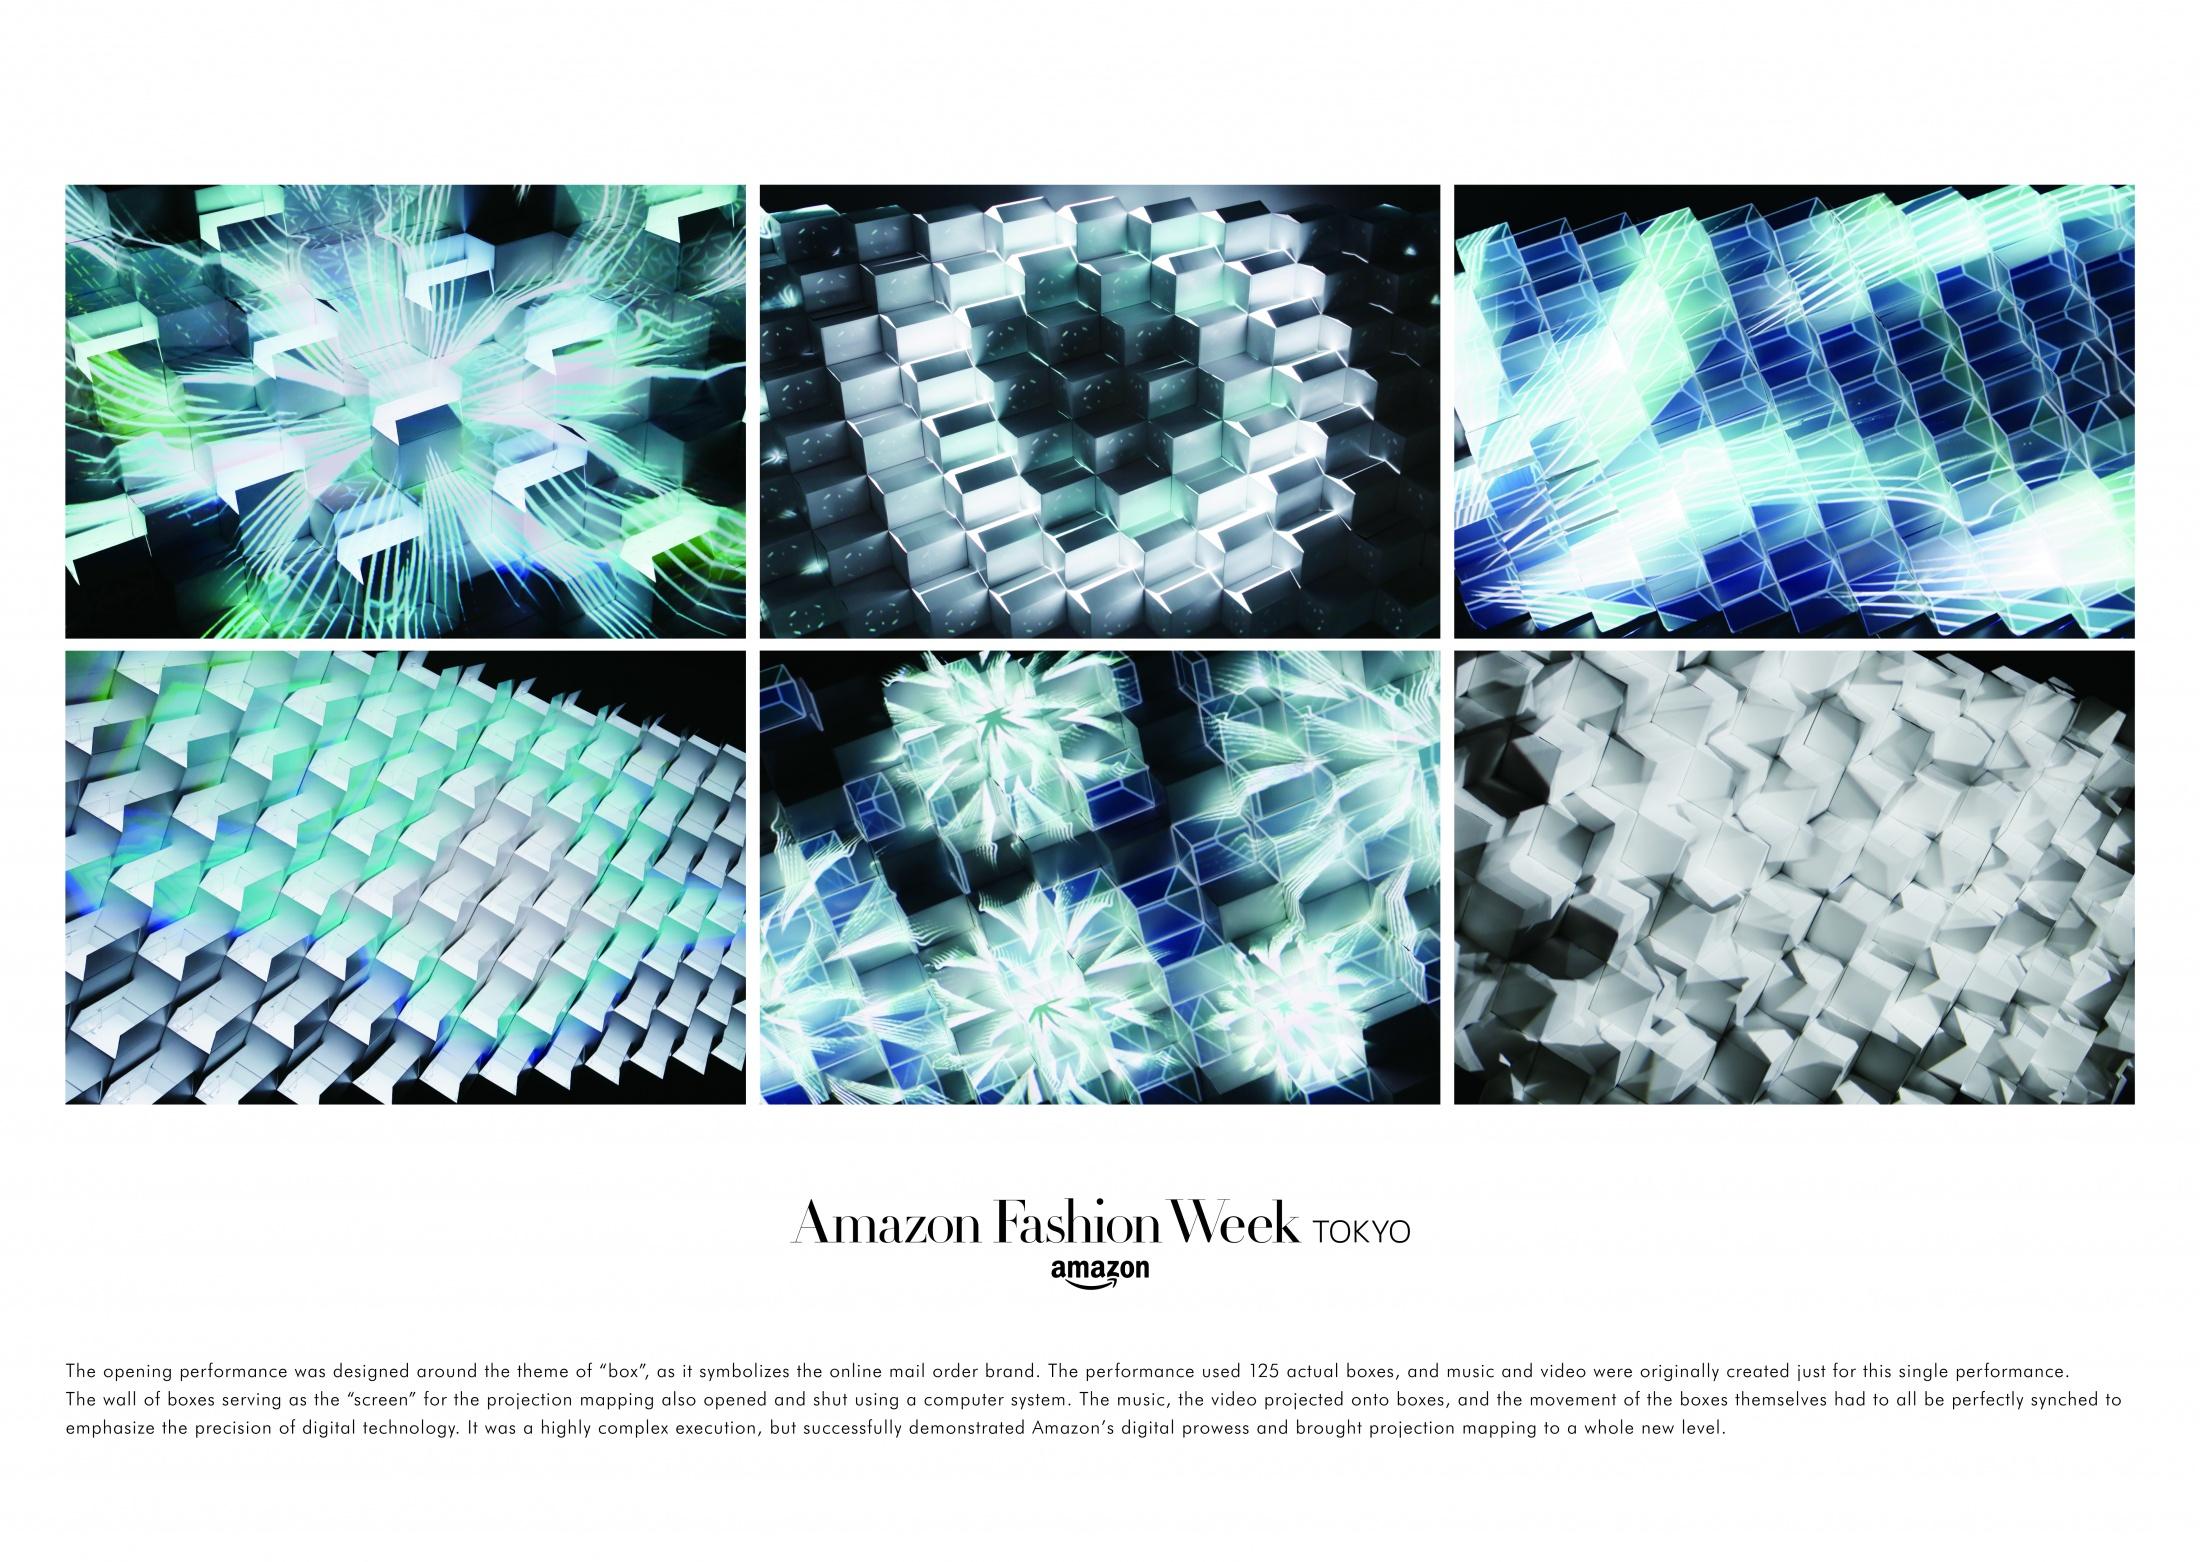 Thumbnail for Amazon Fashion Week Tokyo 2017 S/S Opening Act